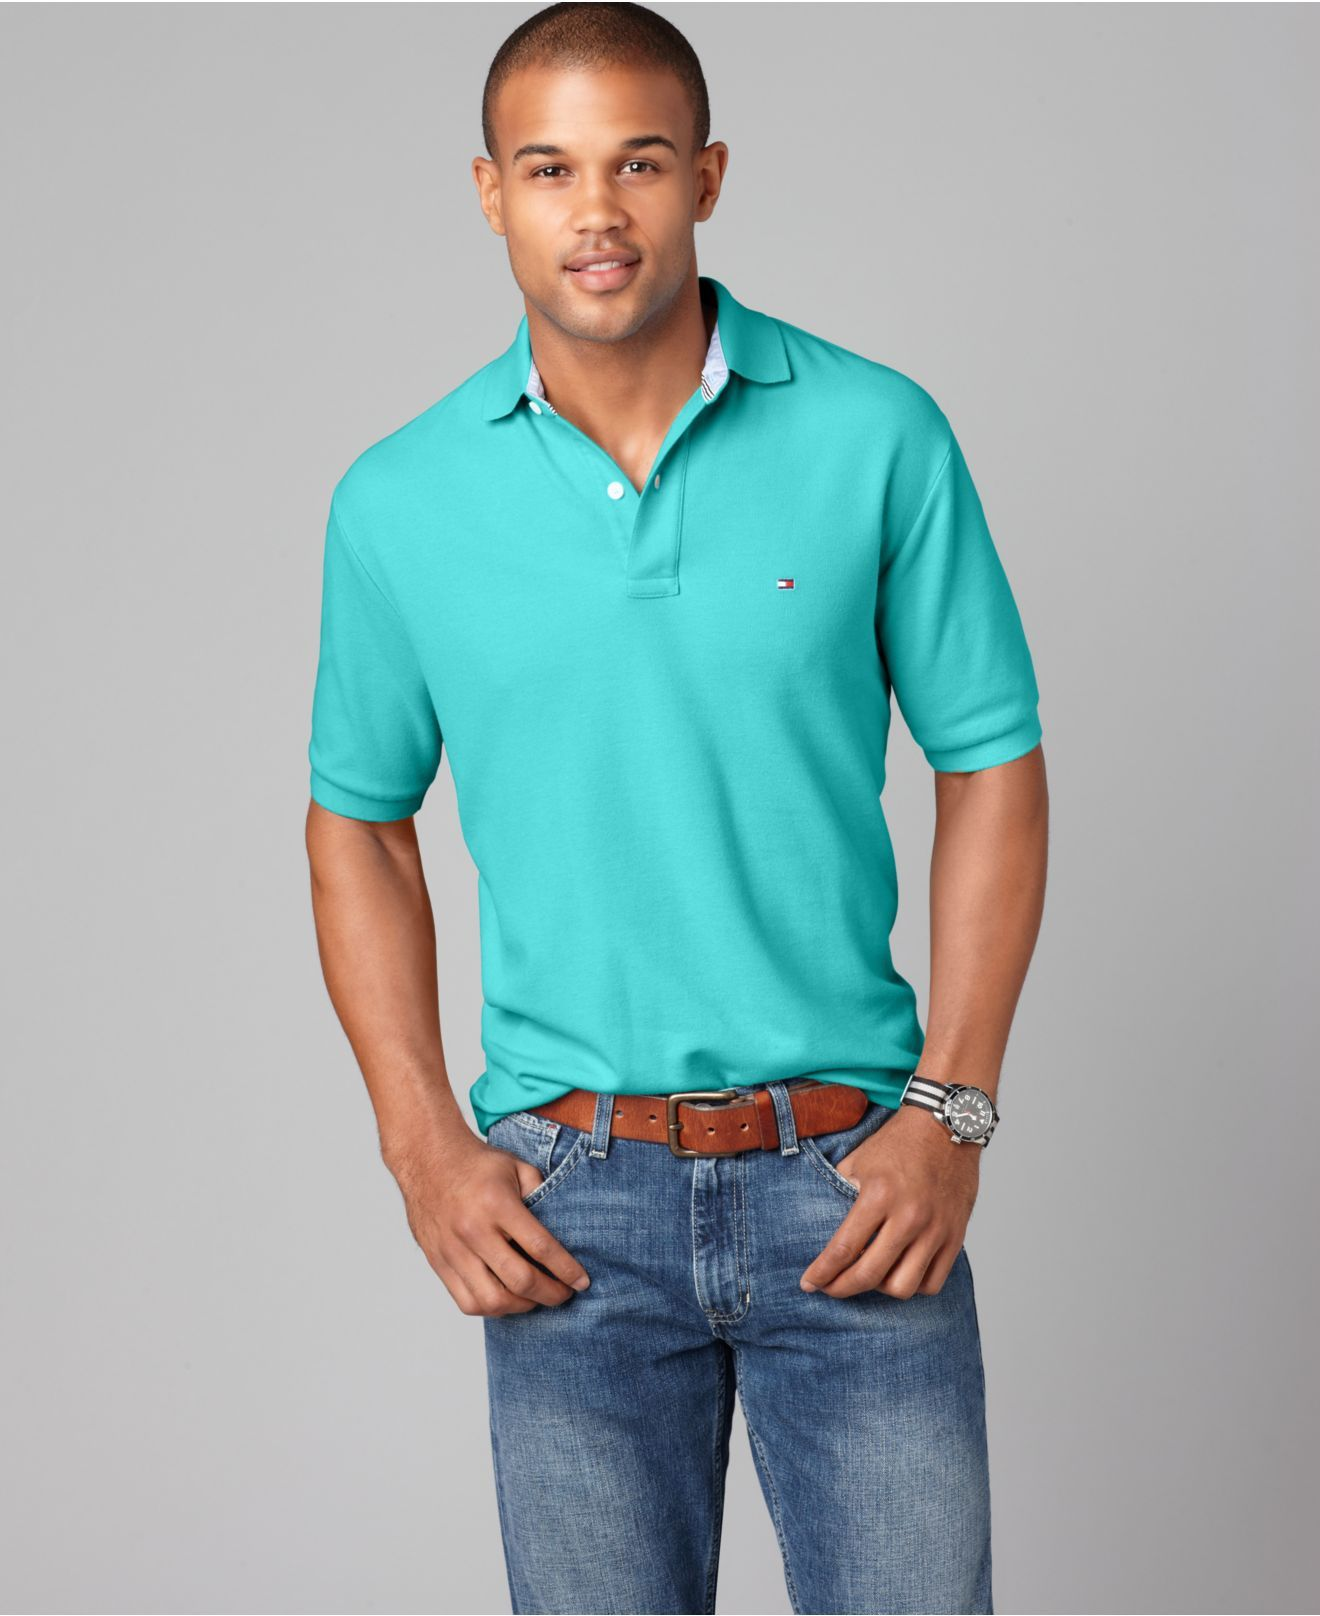 Leg day t shirts men s polo shirt slim - Tommy Hilfiger Shirt Slim Fit Ivy Polo Shirt Mens Polos Macy S